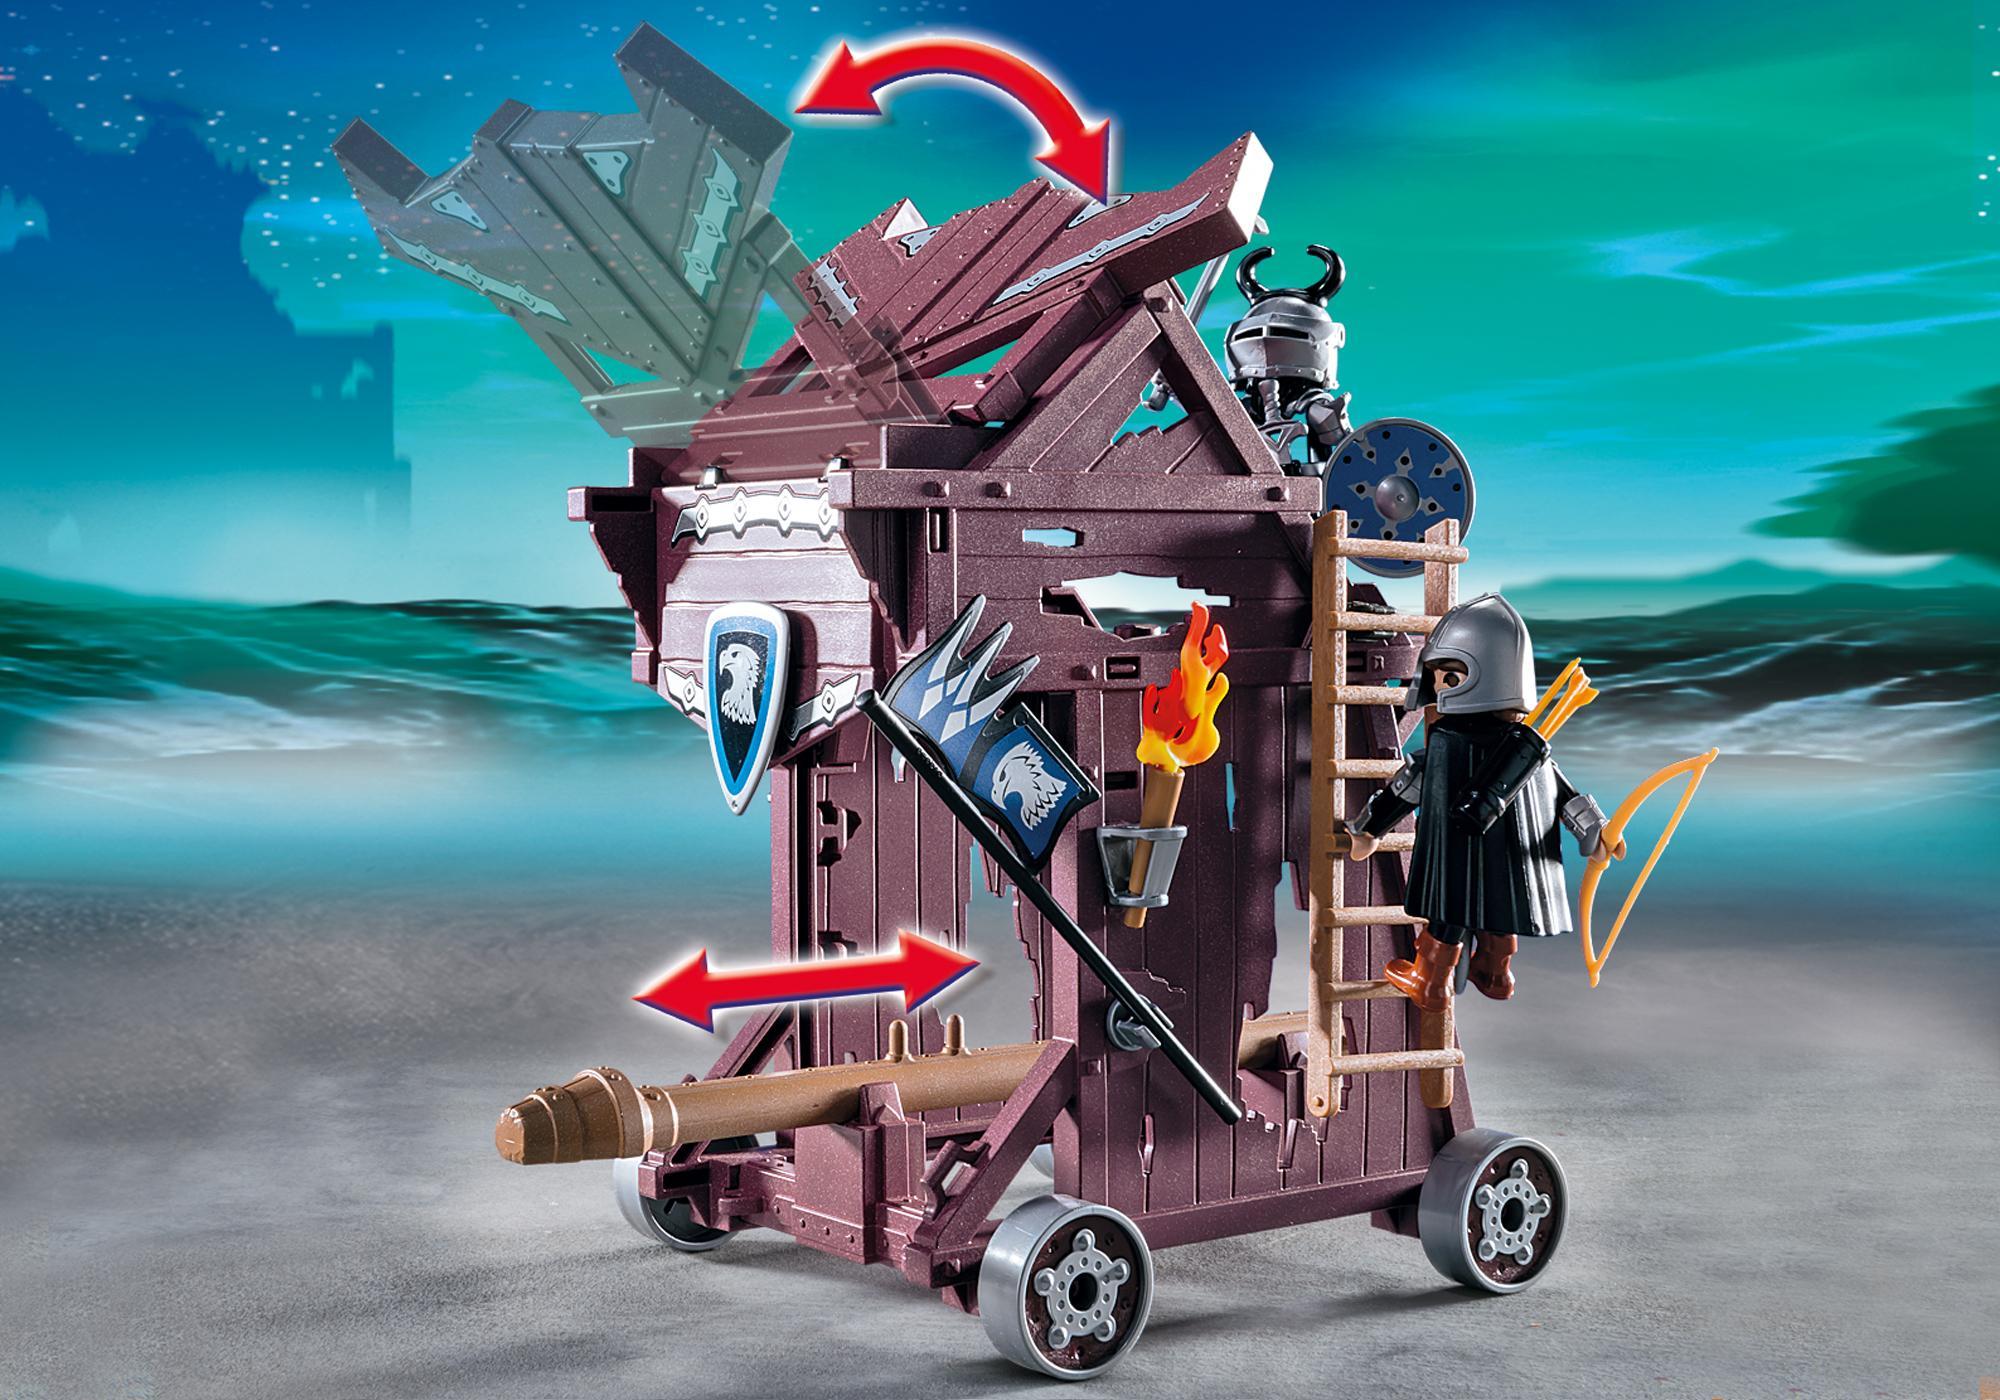 http://media.playmobil.com/i/playmobil/6628_product_extra2/Соперничество Рыцарей: Рыцари Орла атакуют Башню